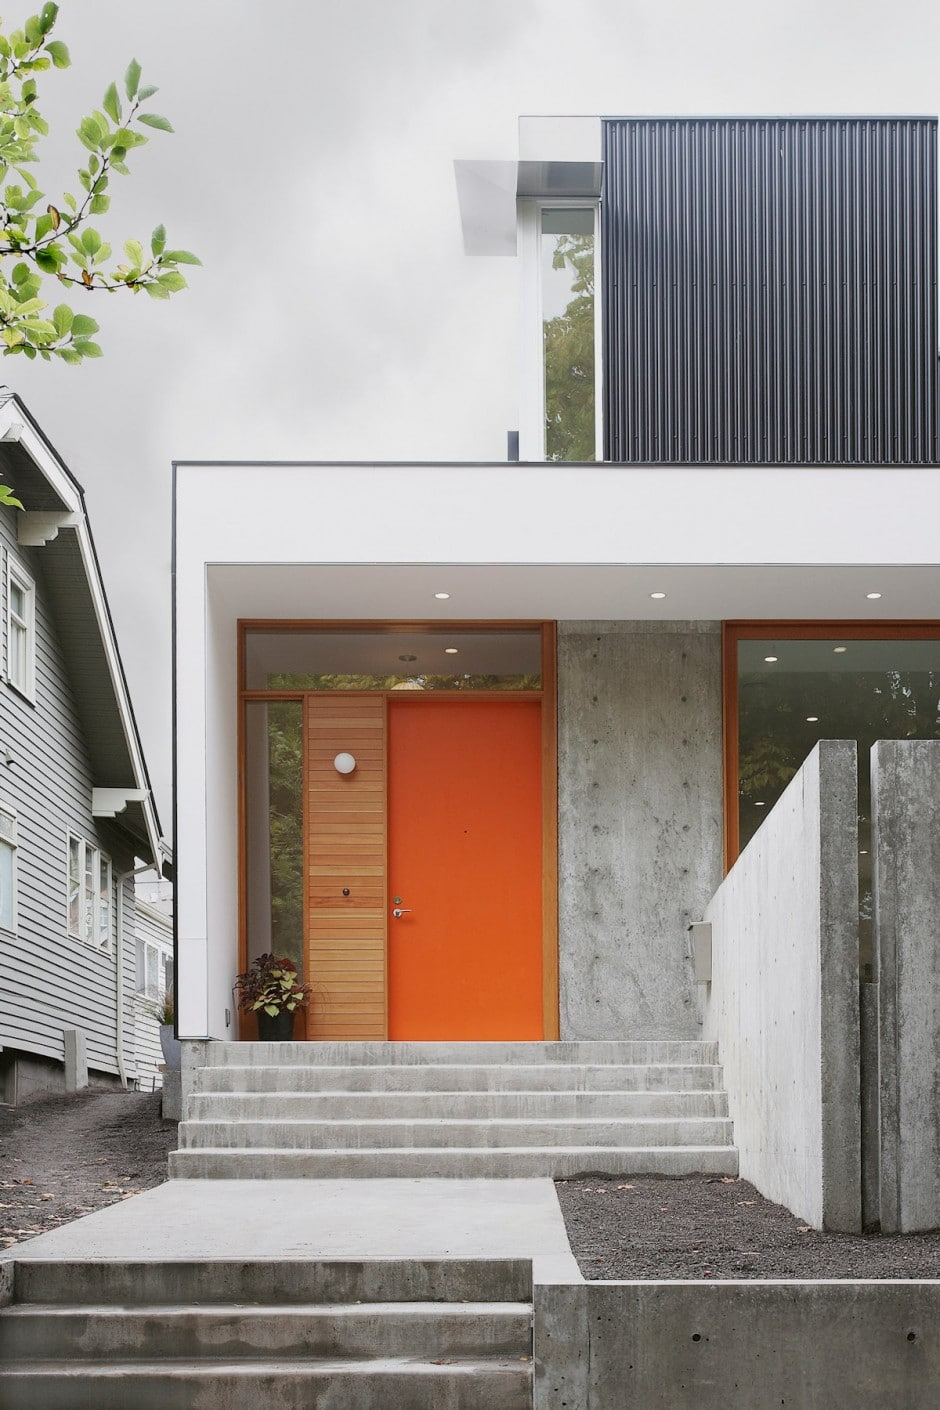 Planos de casa de dos pisos en terreno peque o construye for Puertas de ingreso principal modernas